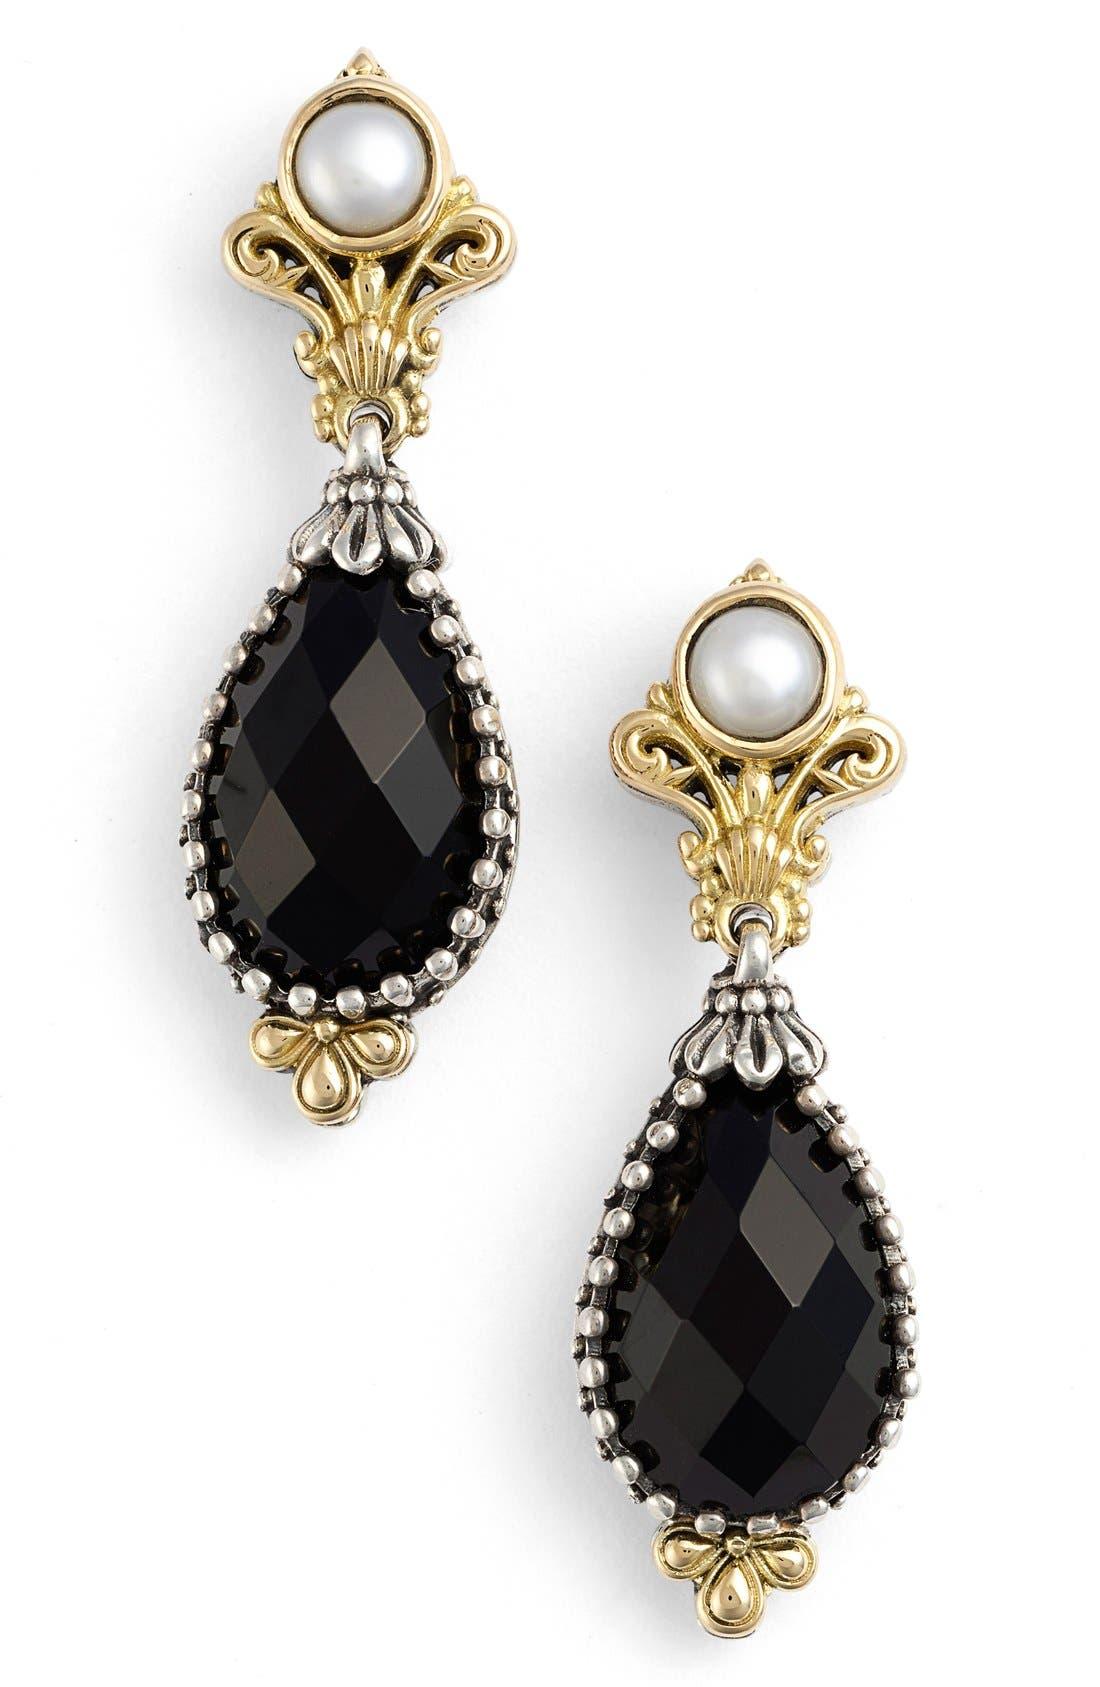 Konstantino 'Nykta' Pearl & Black Onyx Drop Earrings